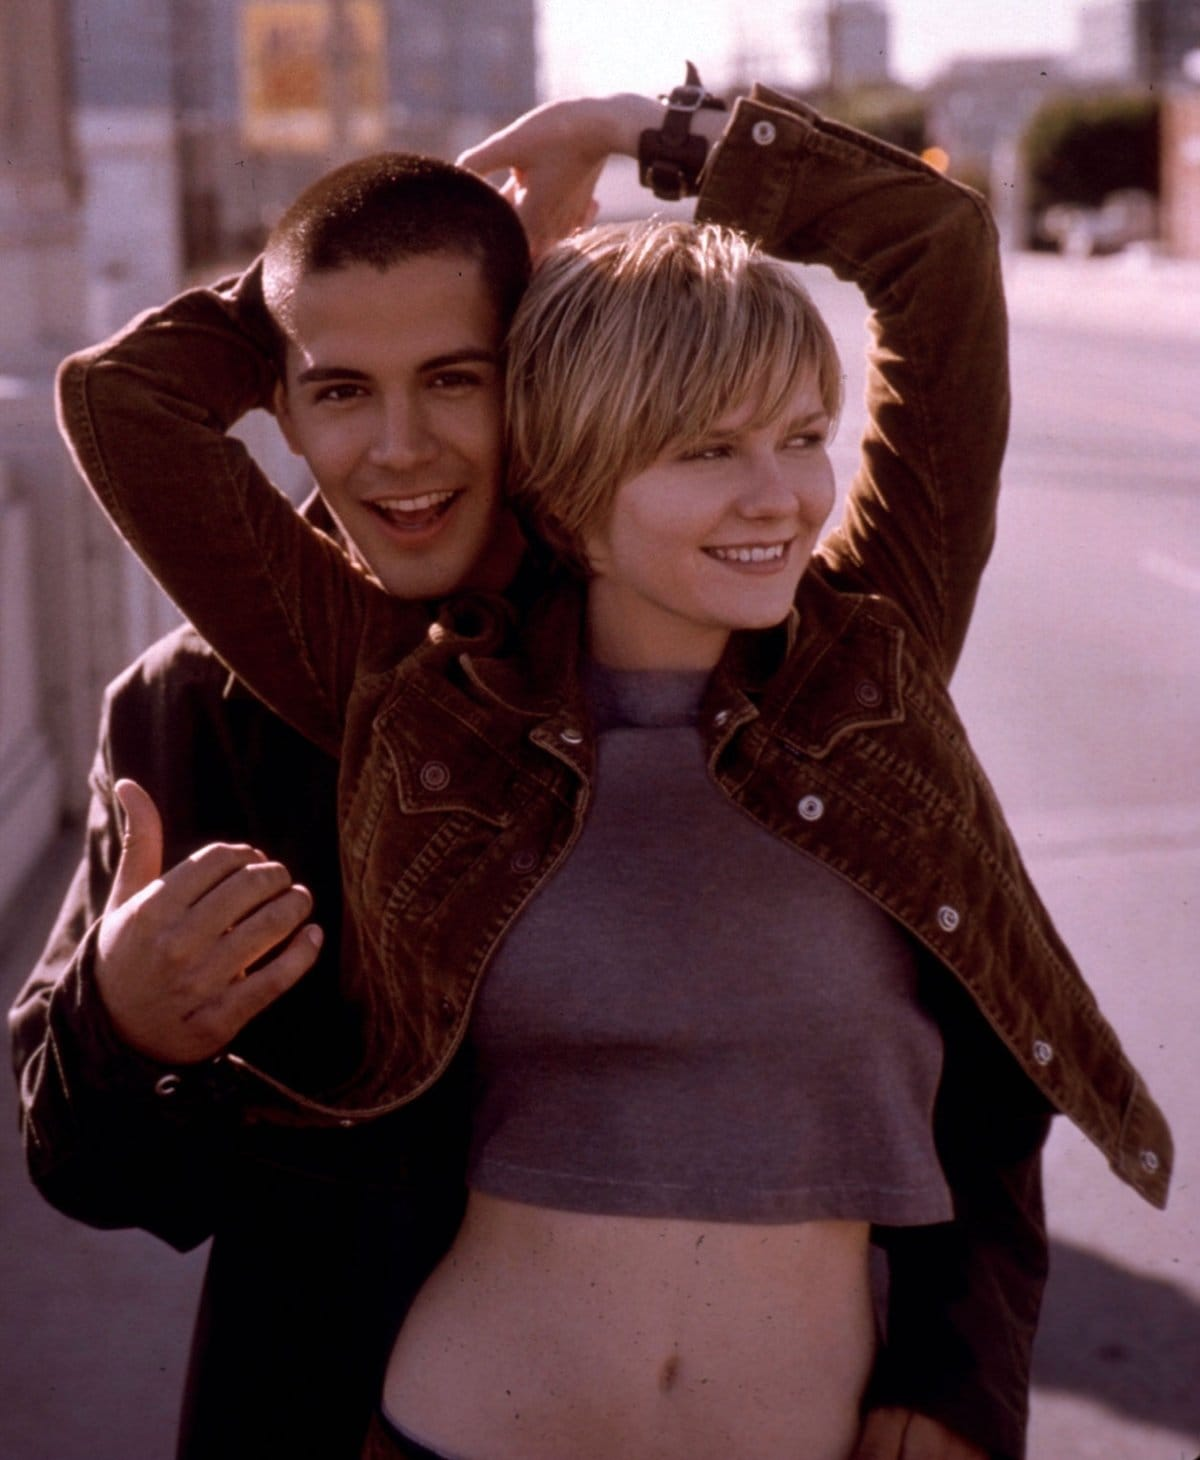 Kirsten Dunst as Nicole Oakley and Jay Hernandez as Carlos Nuñez in the 2001 American teen romantic drama film Crazy/Beautiful